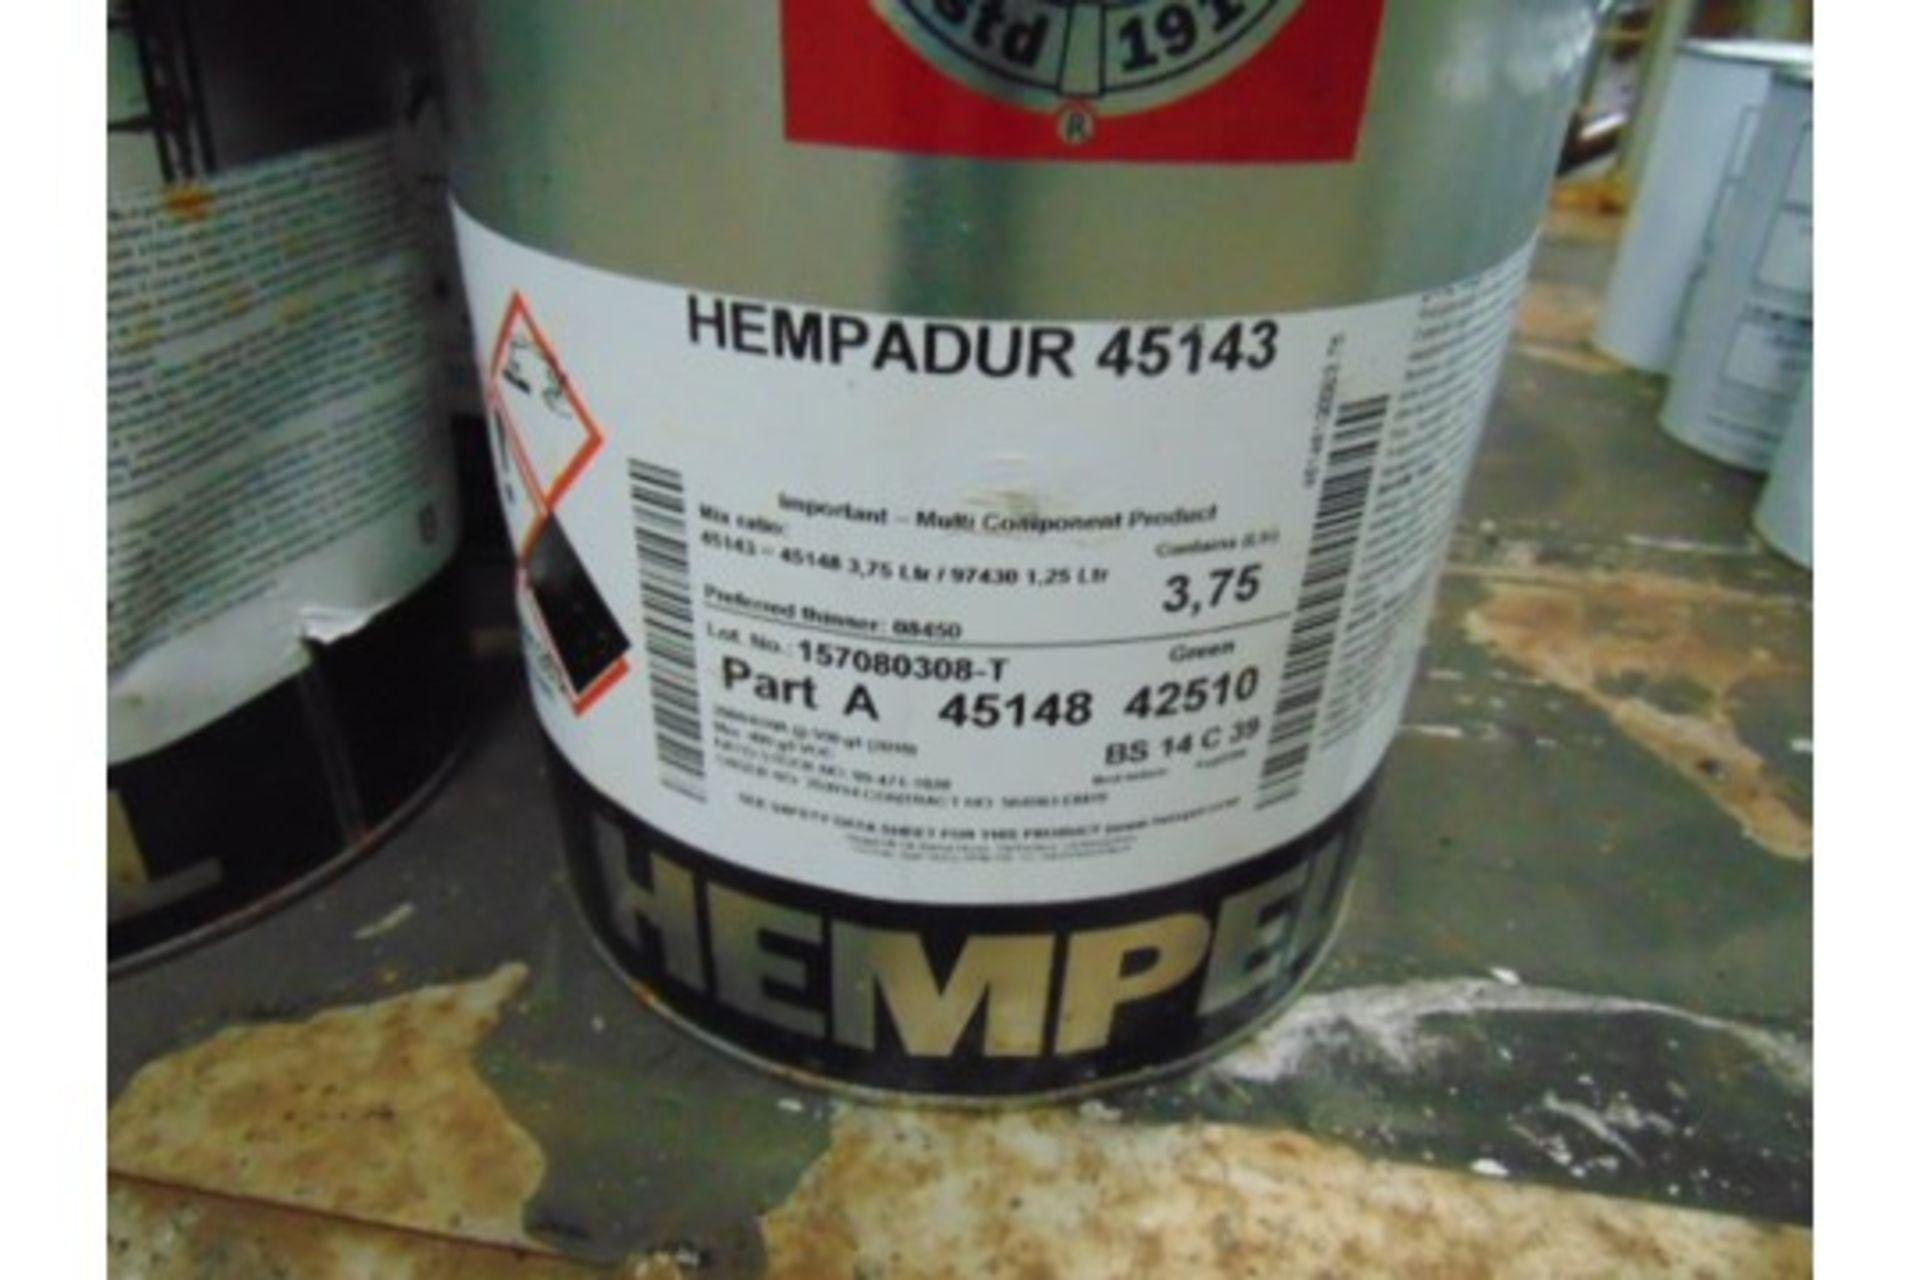 Lot 26610 - 6 x Hempadur 45153 2-Part Epoxy Paint System